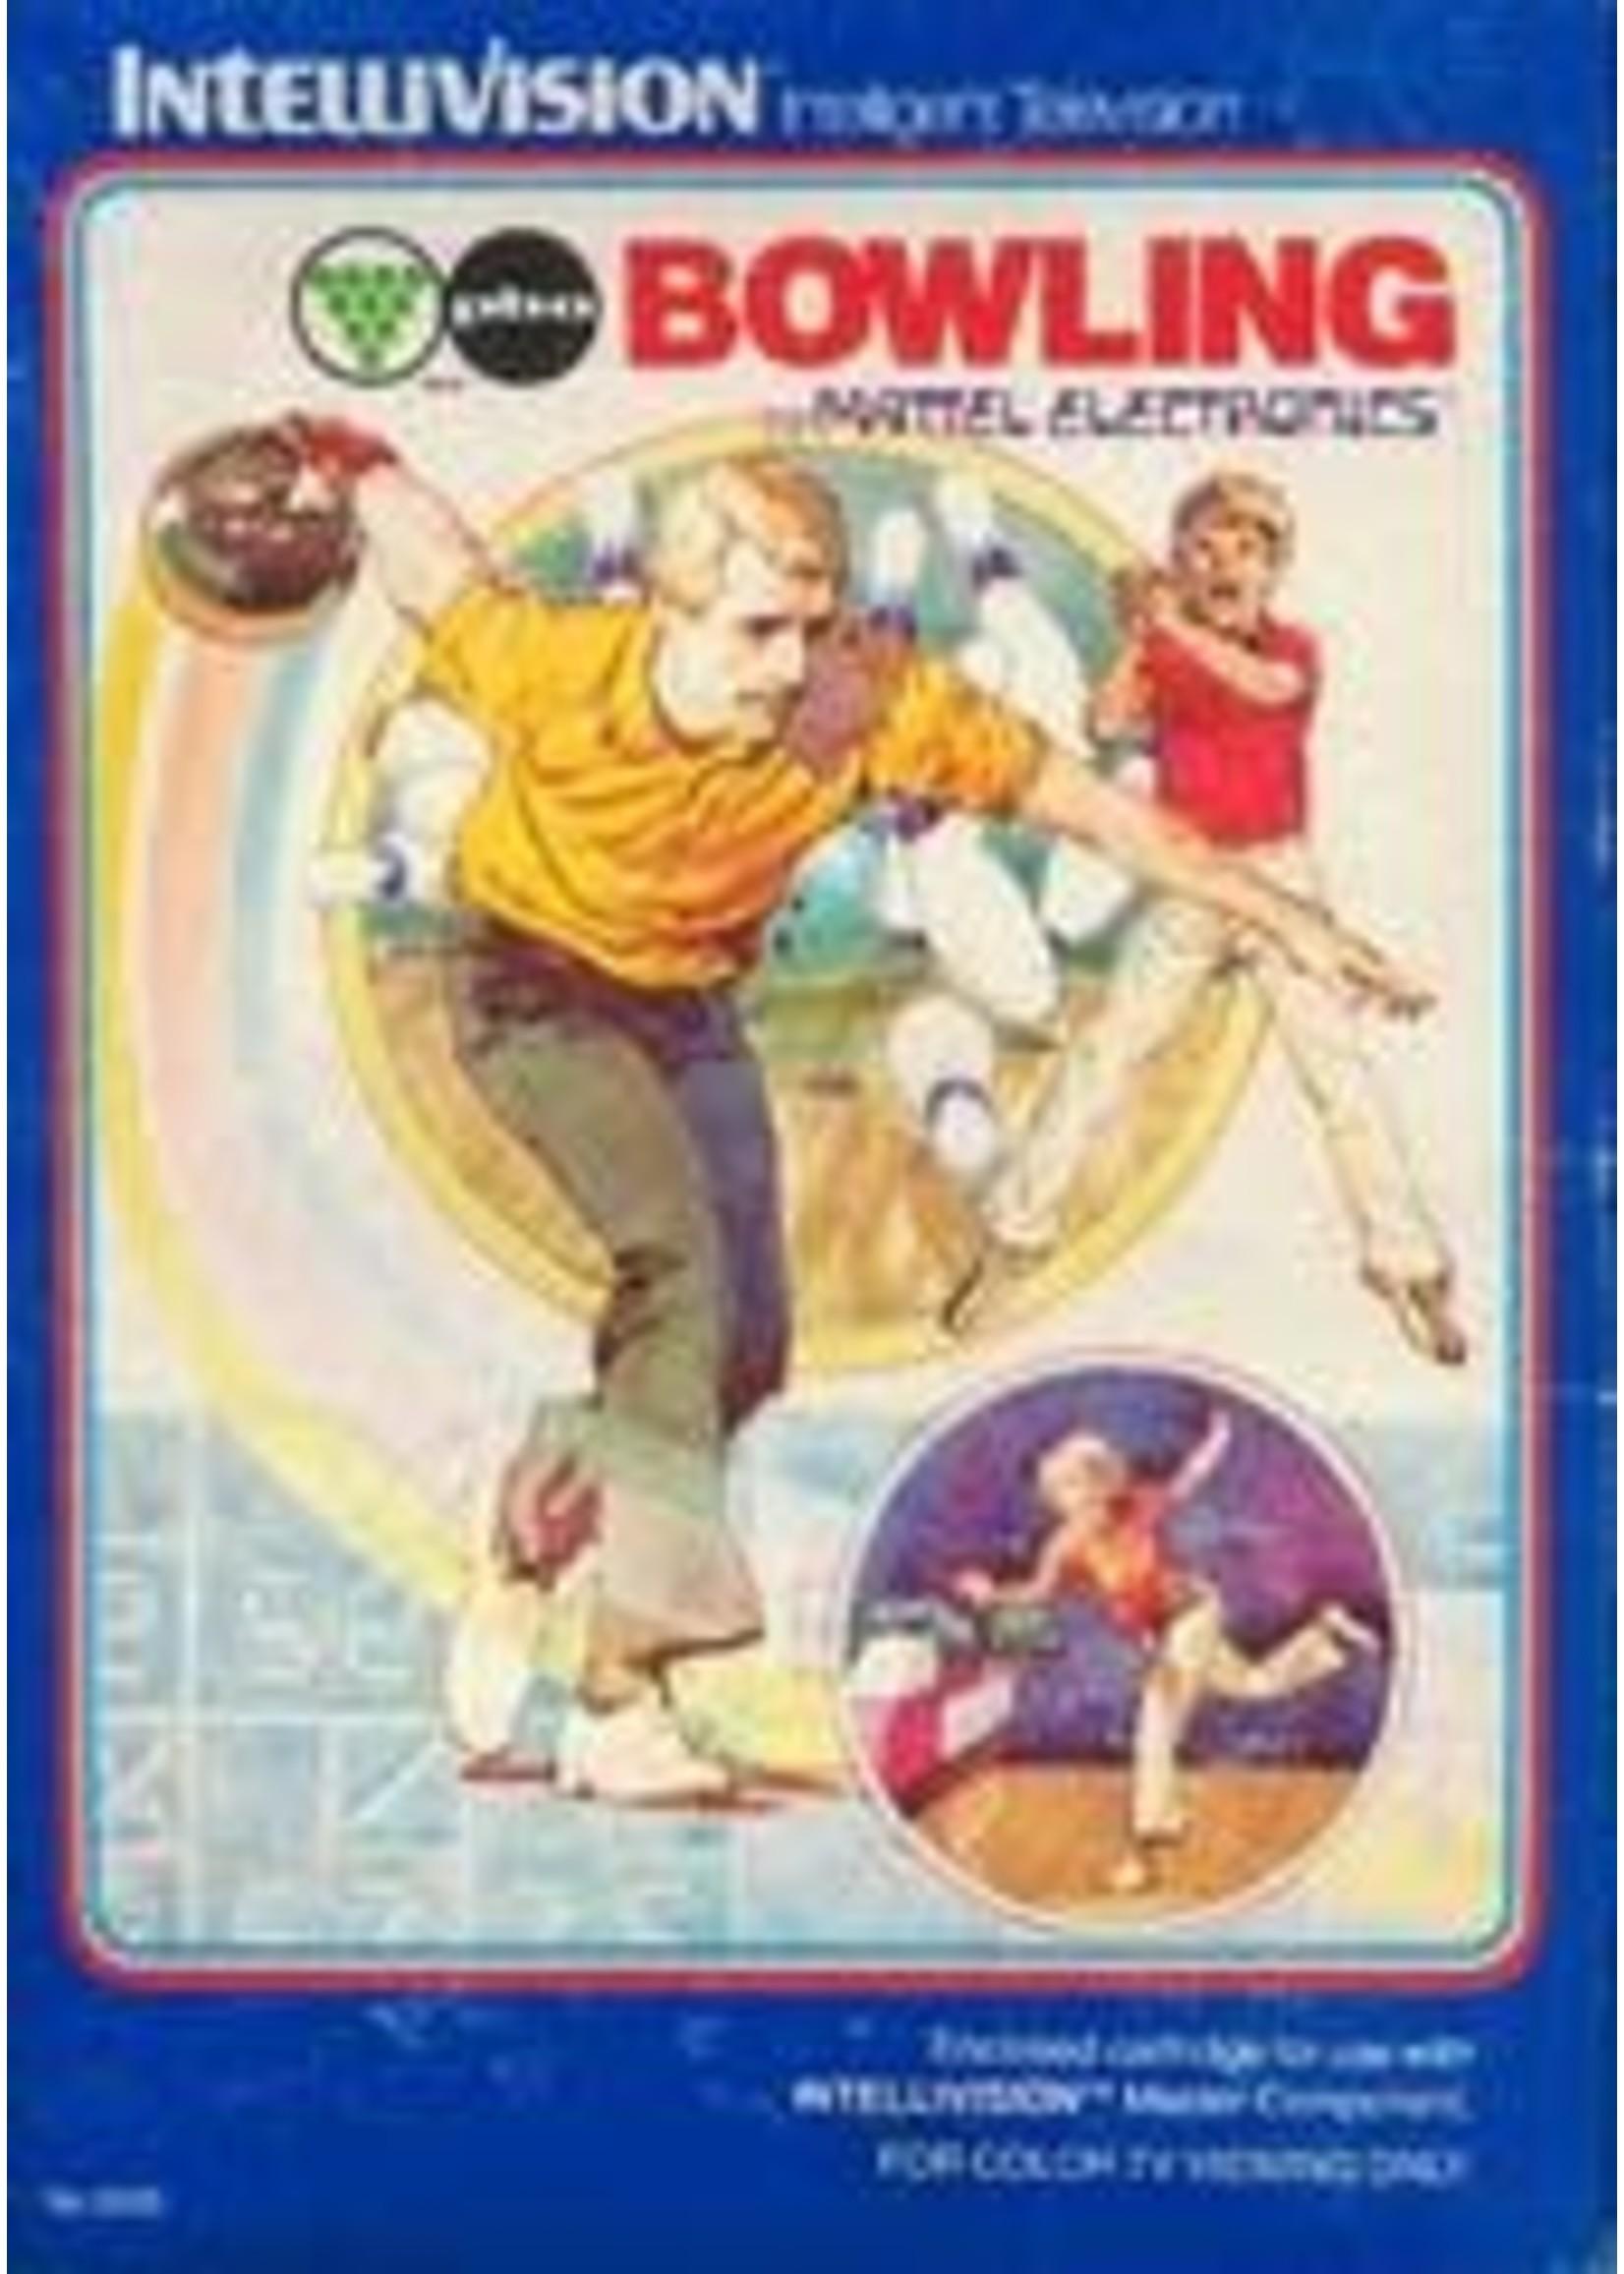 Bowling Intellivision